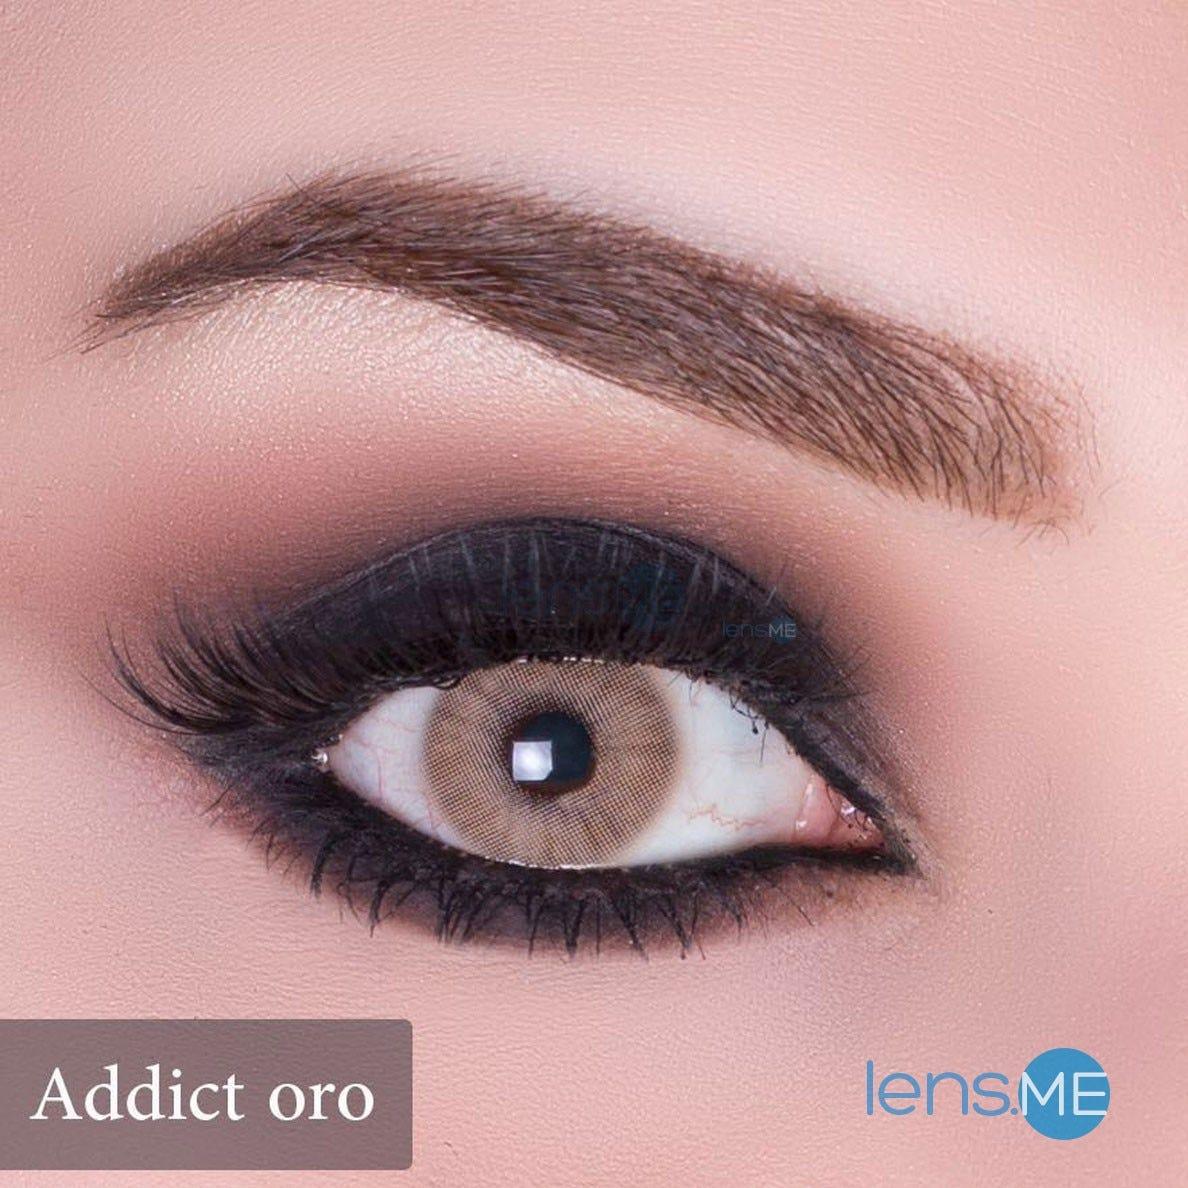 Anesthesia lenses dream anesthetic addict usa anesthesia addict oro 2 lenses nvjuhfo Image collections